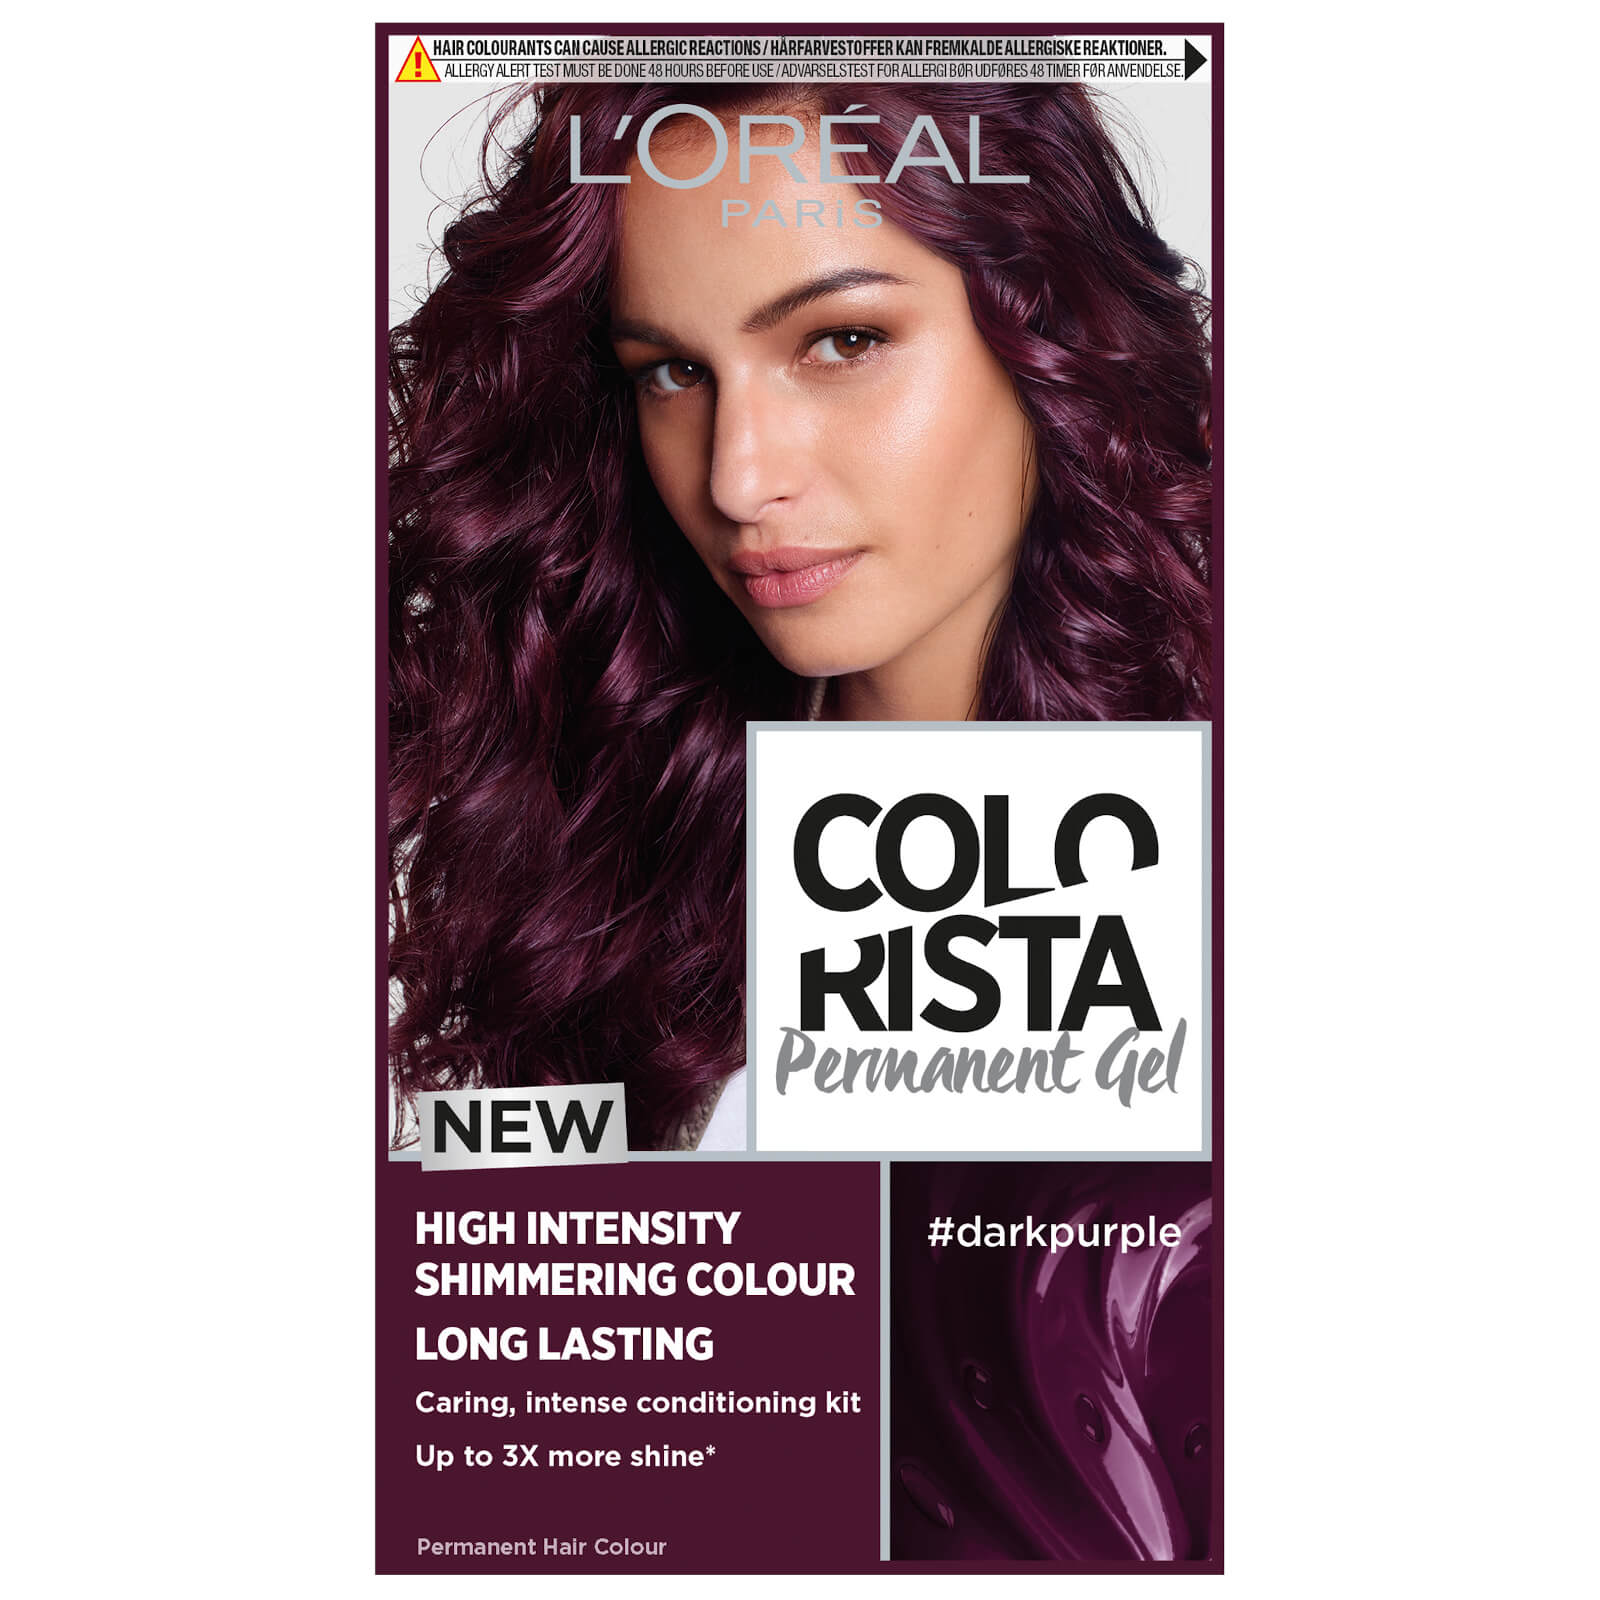 L'Oréal Paris Colorista Permanent Gel Hair Dye (Various Shades) - Dark Purple